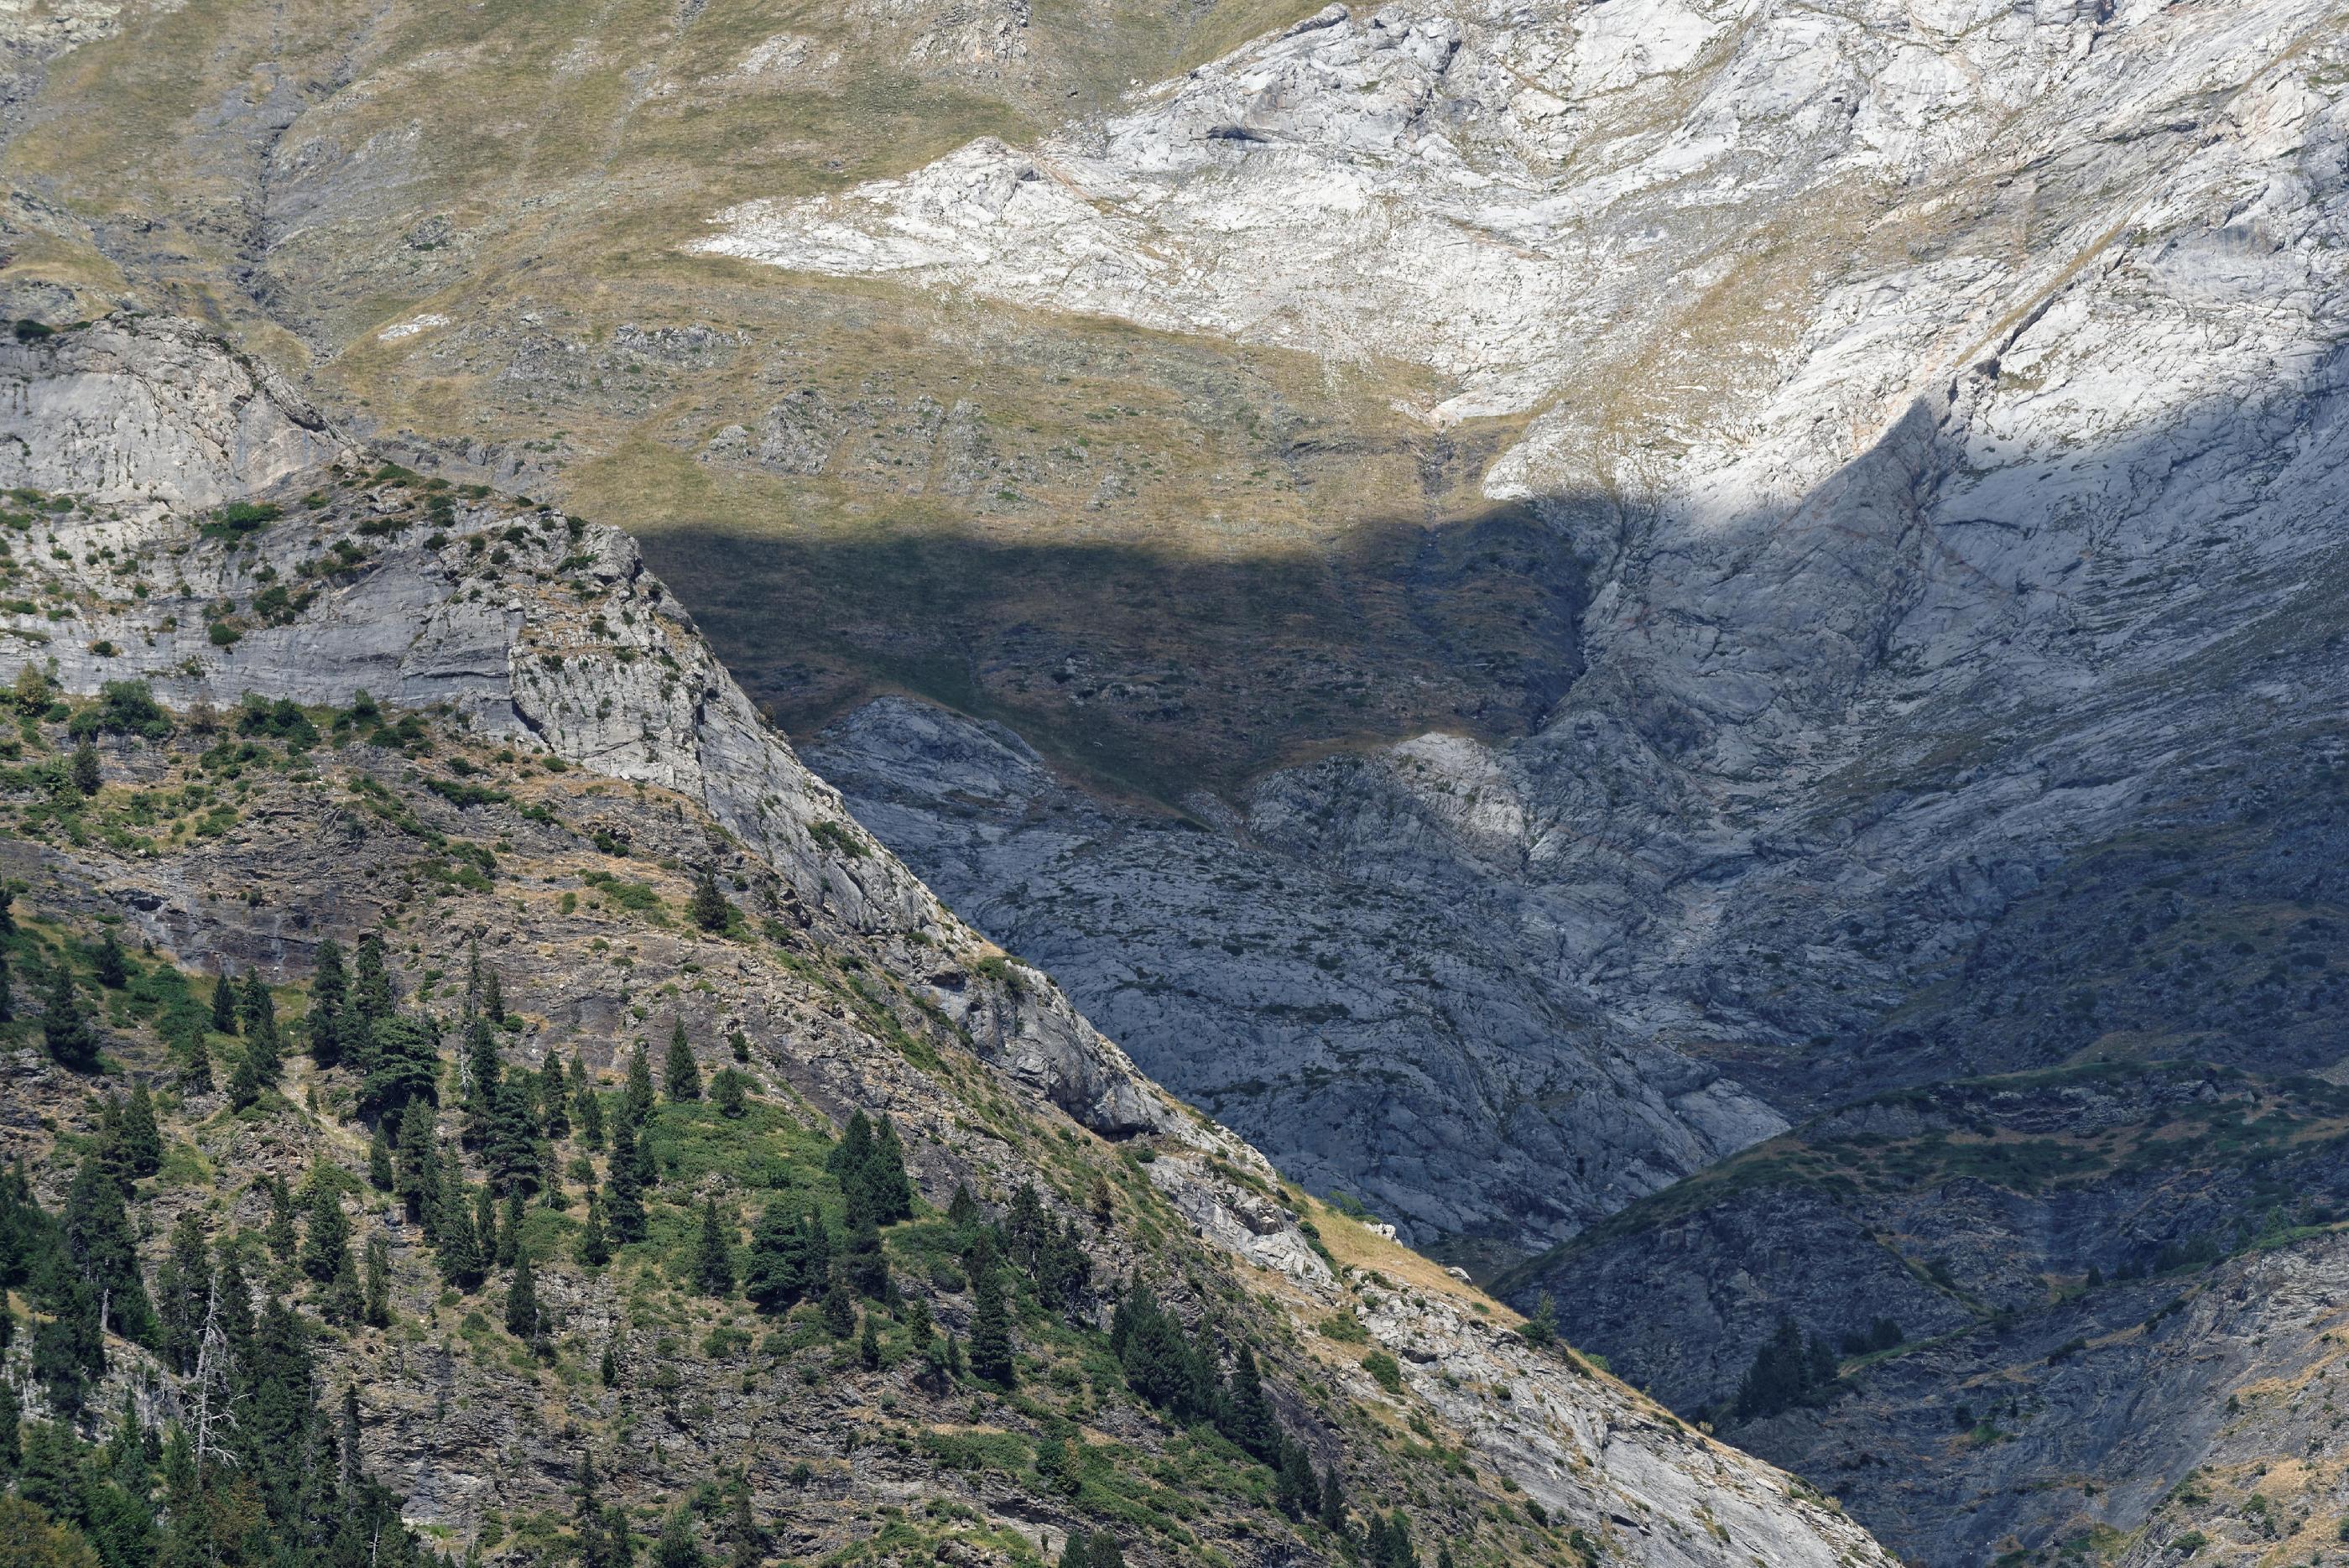 160910-marche-cascade-du-cinca-et-de-la-larri-sobrarbe-aragon-162